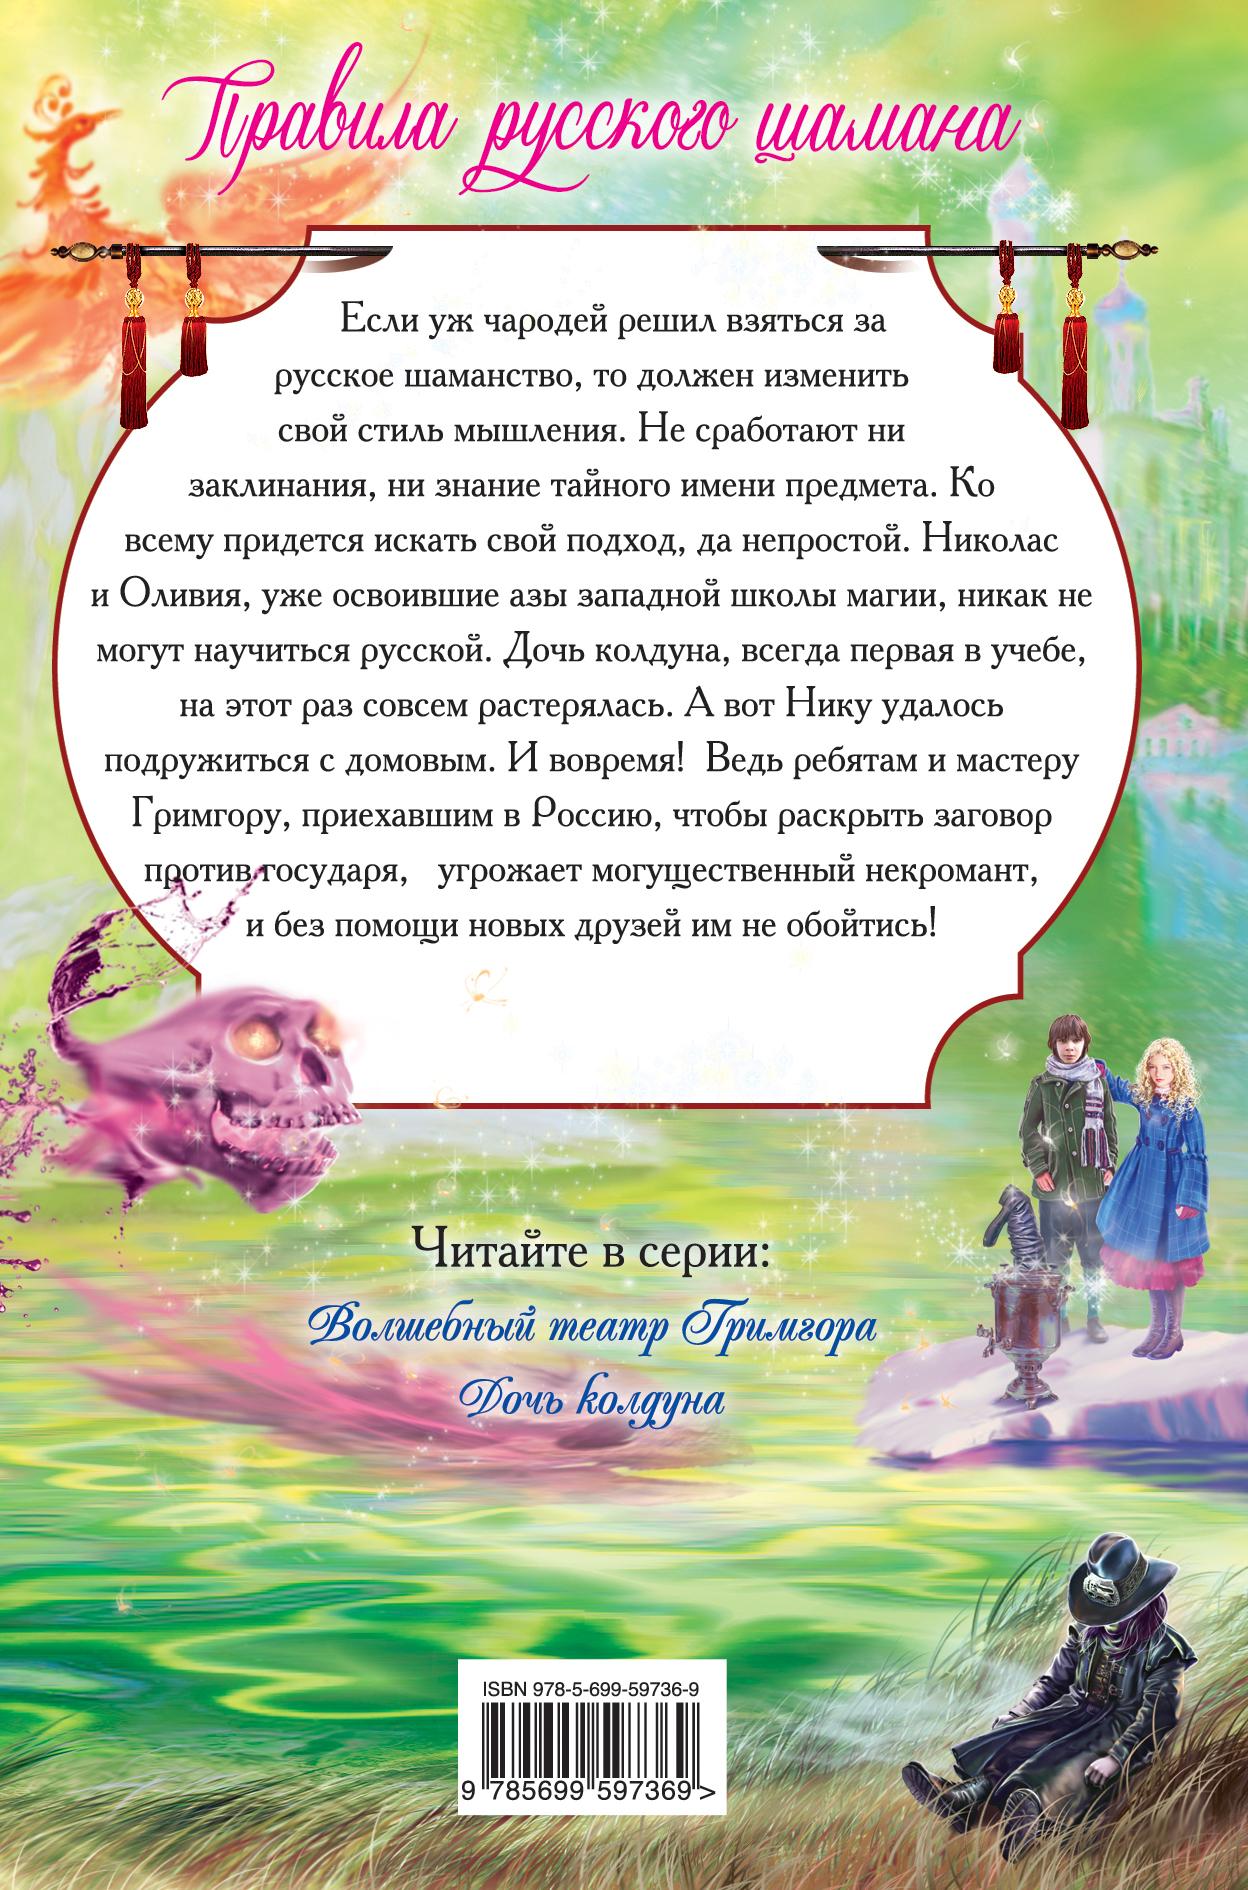 Правила русского шамана